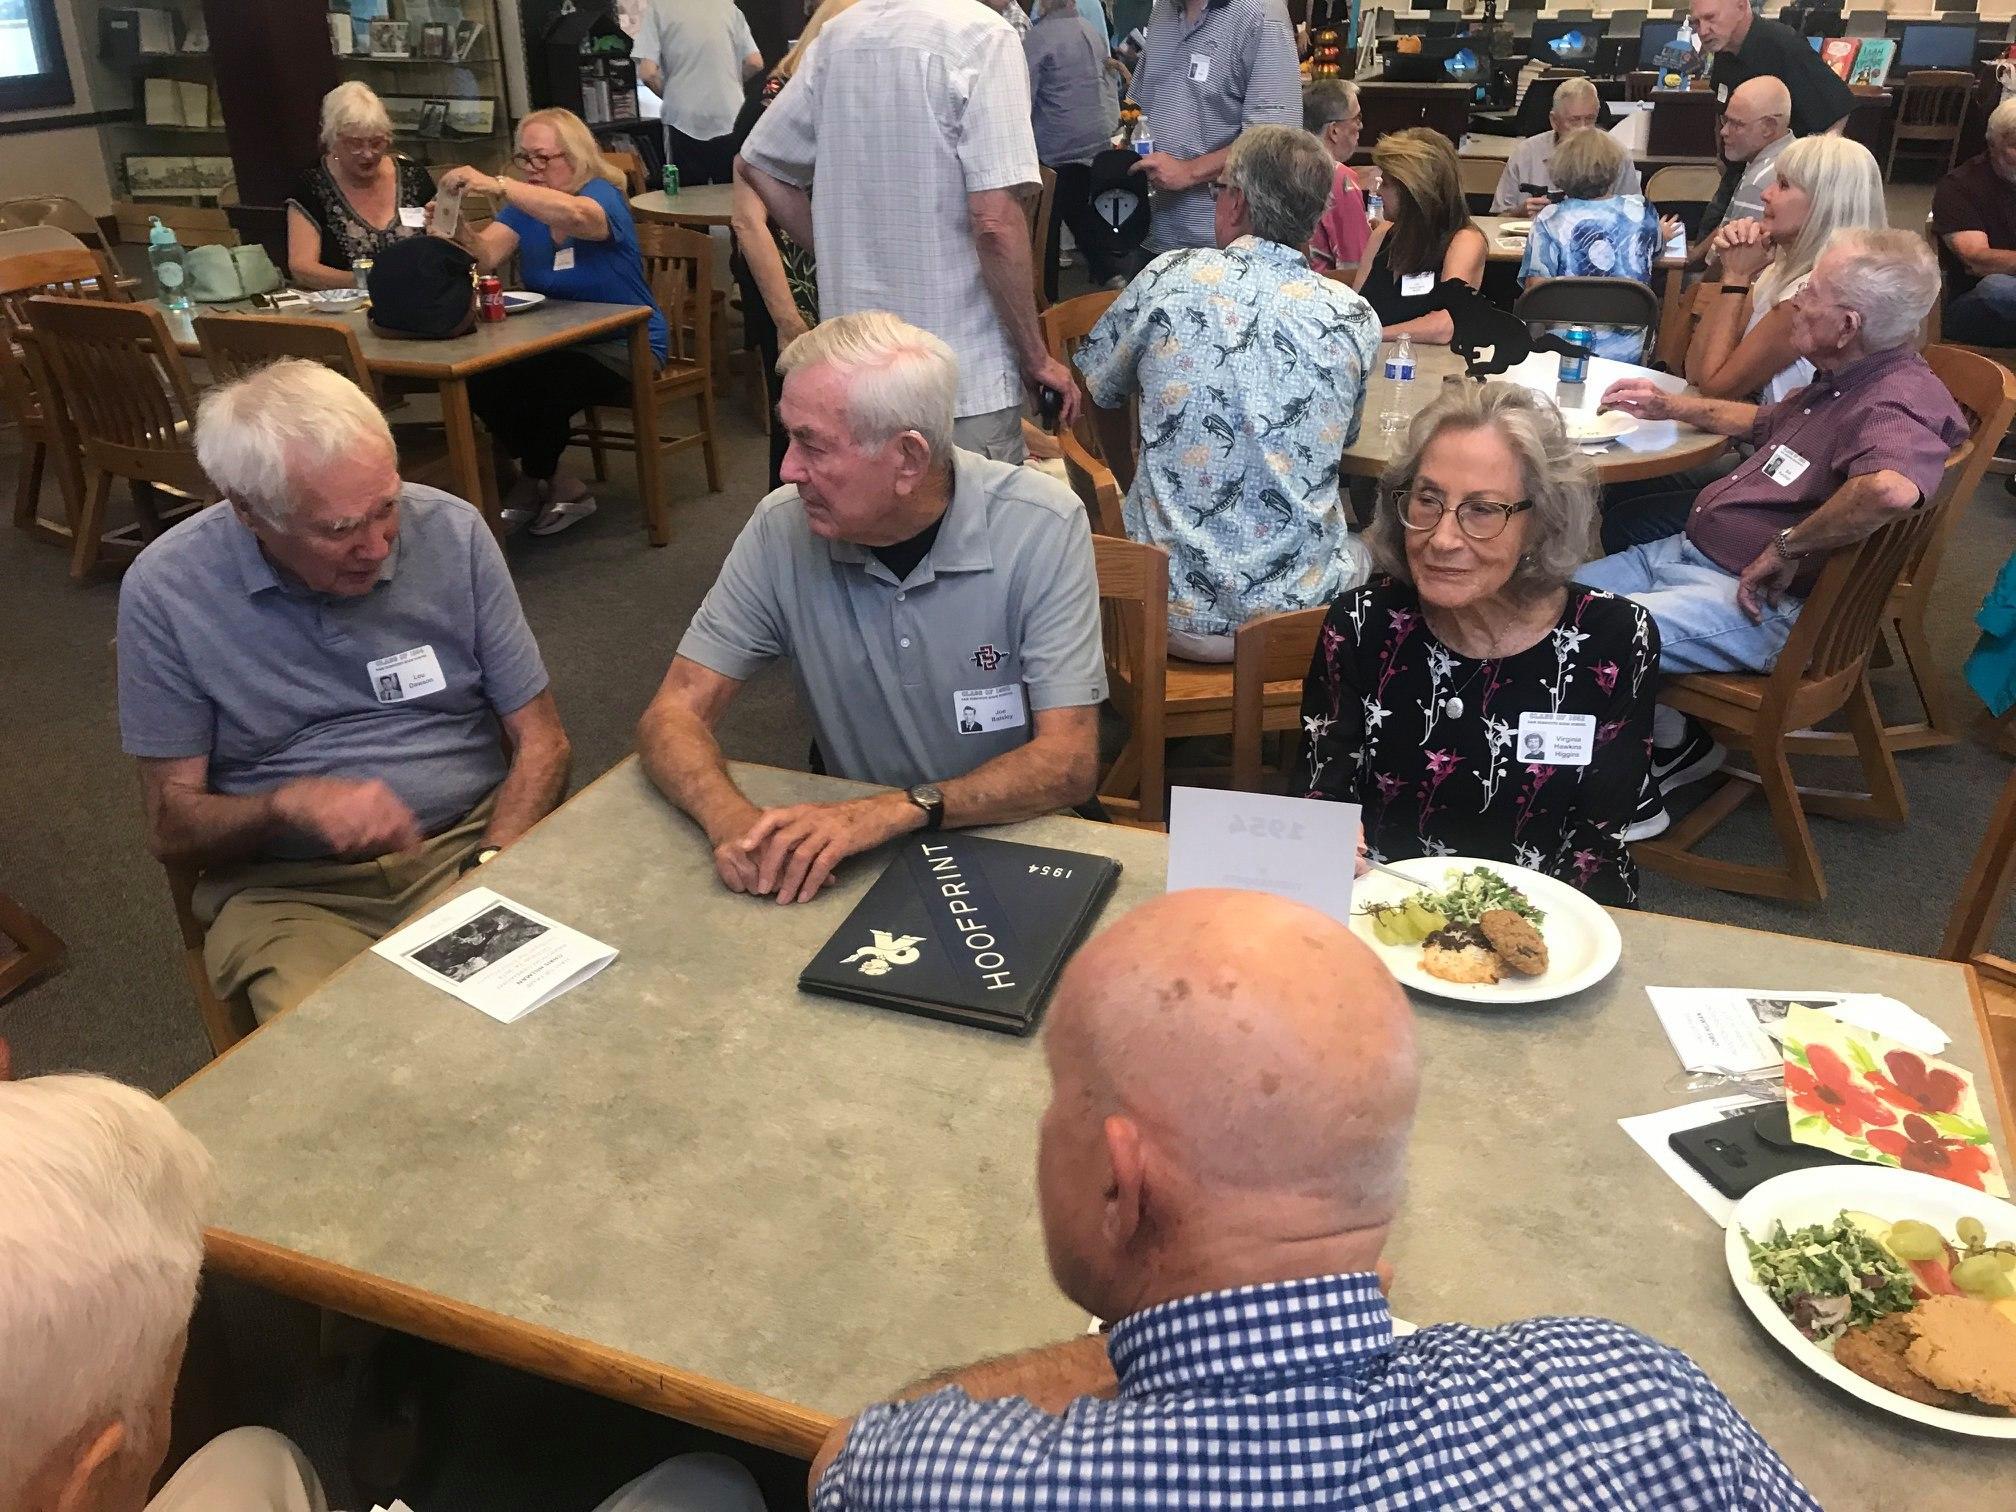 Alumni seated at table